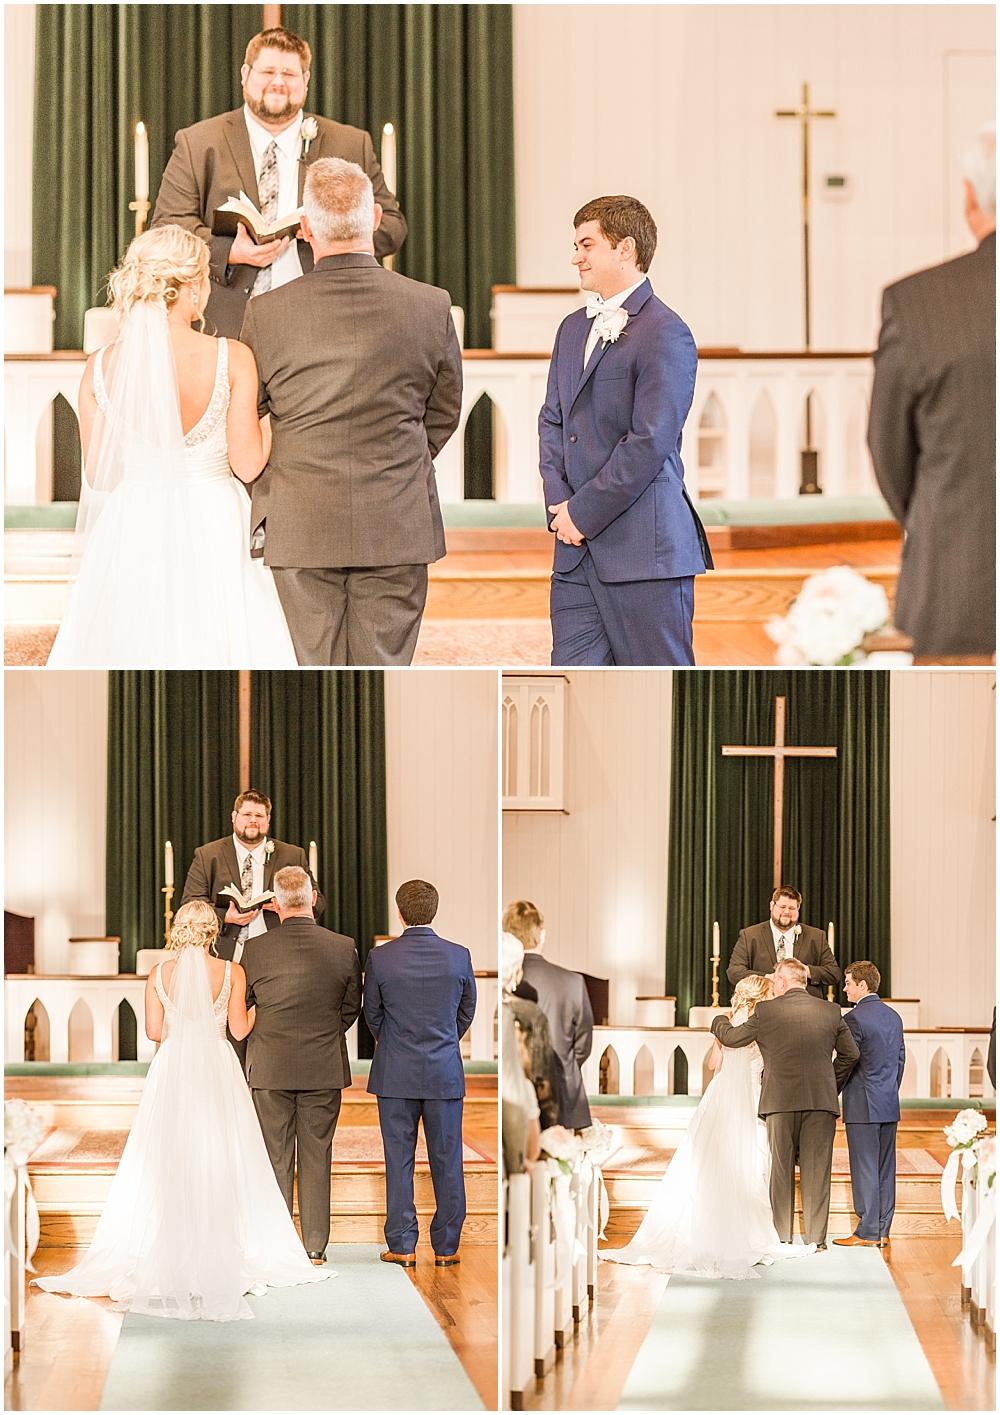 Ashton-Clark-Photography-Wedding-Portrait-Family-Photographer-Mobile-Alabama_0327.jpg